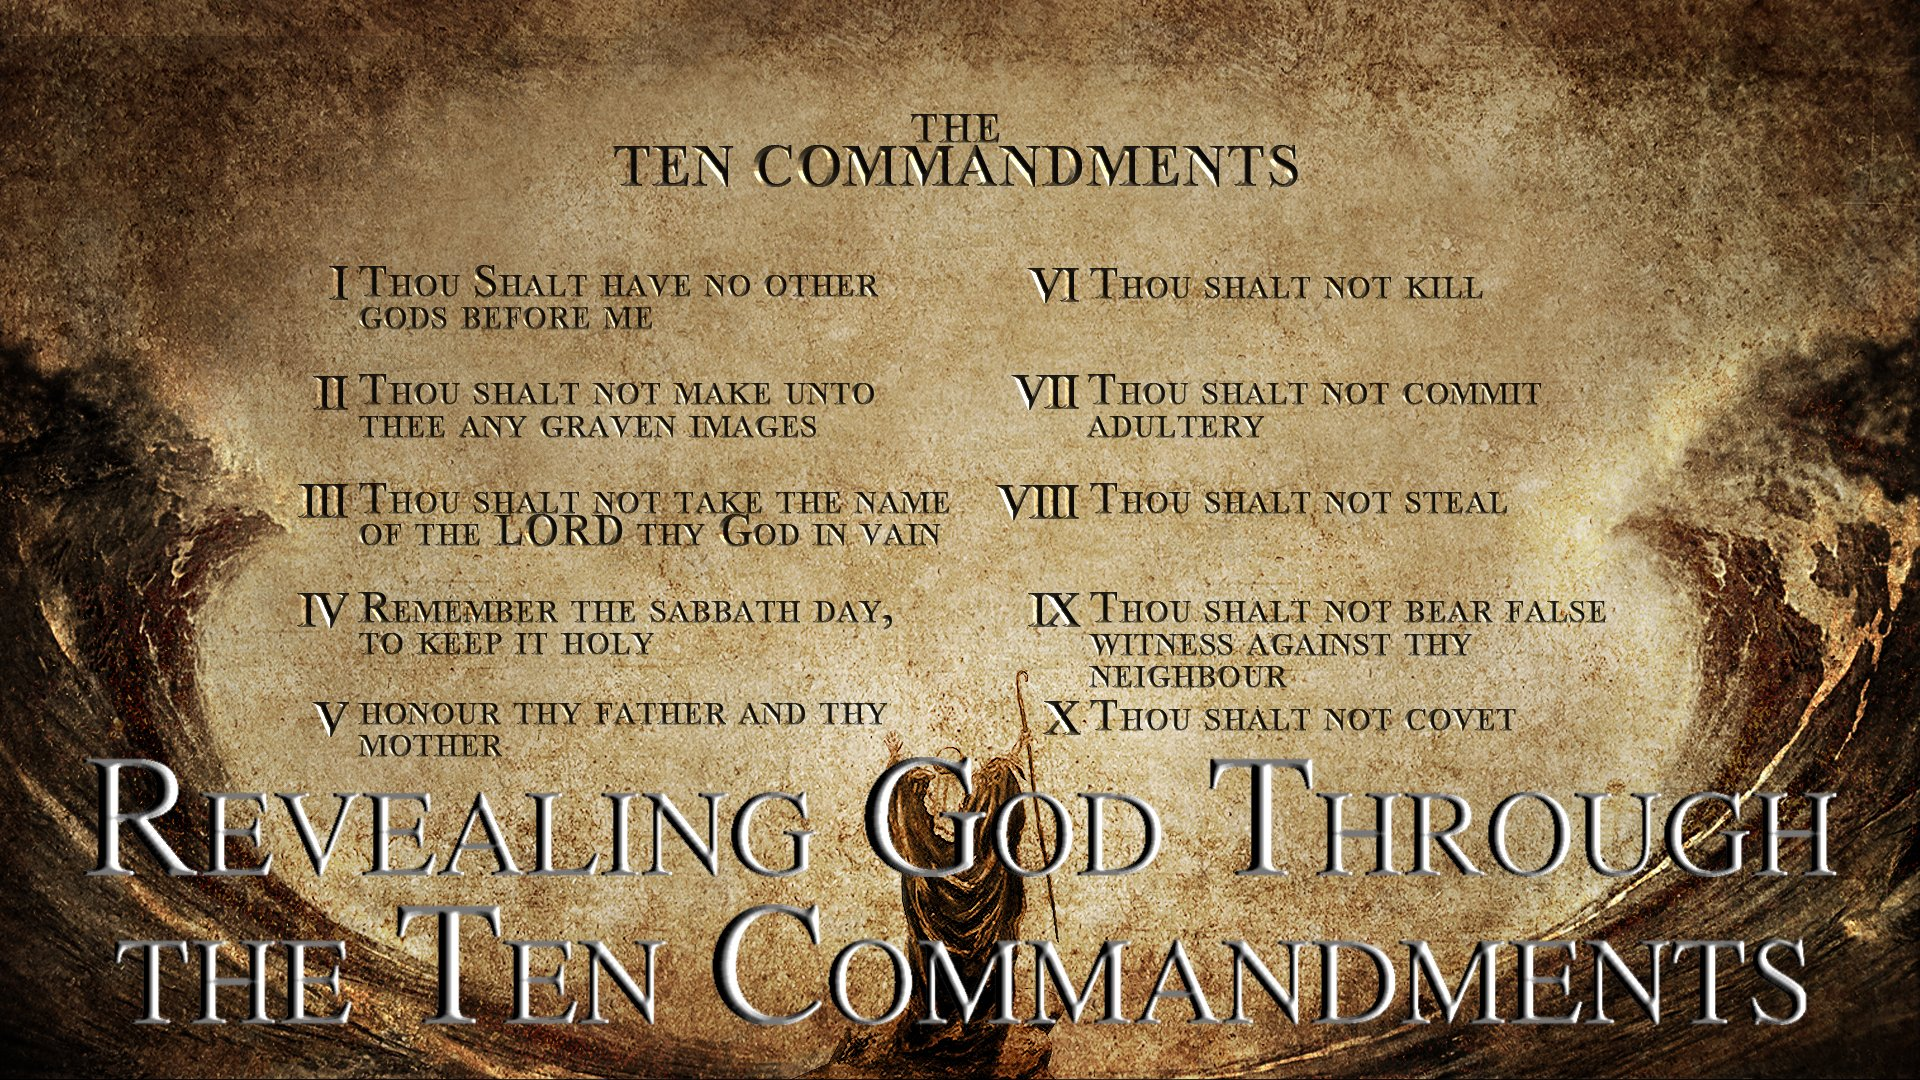 22 Revealing God Through the Ten Commandments